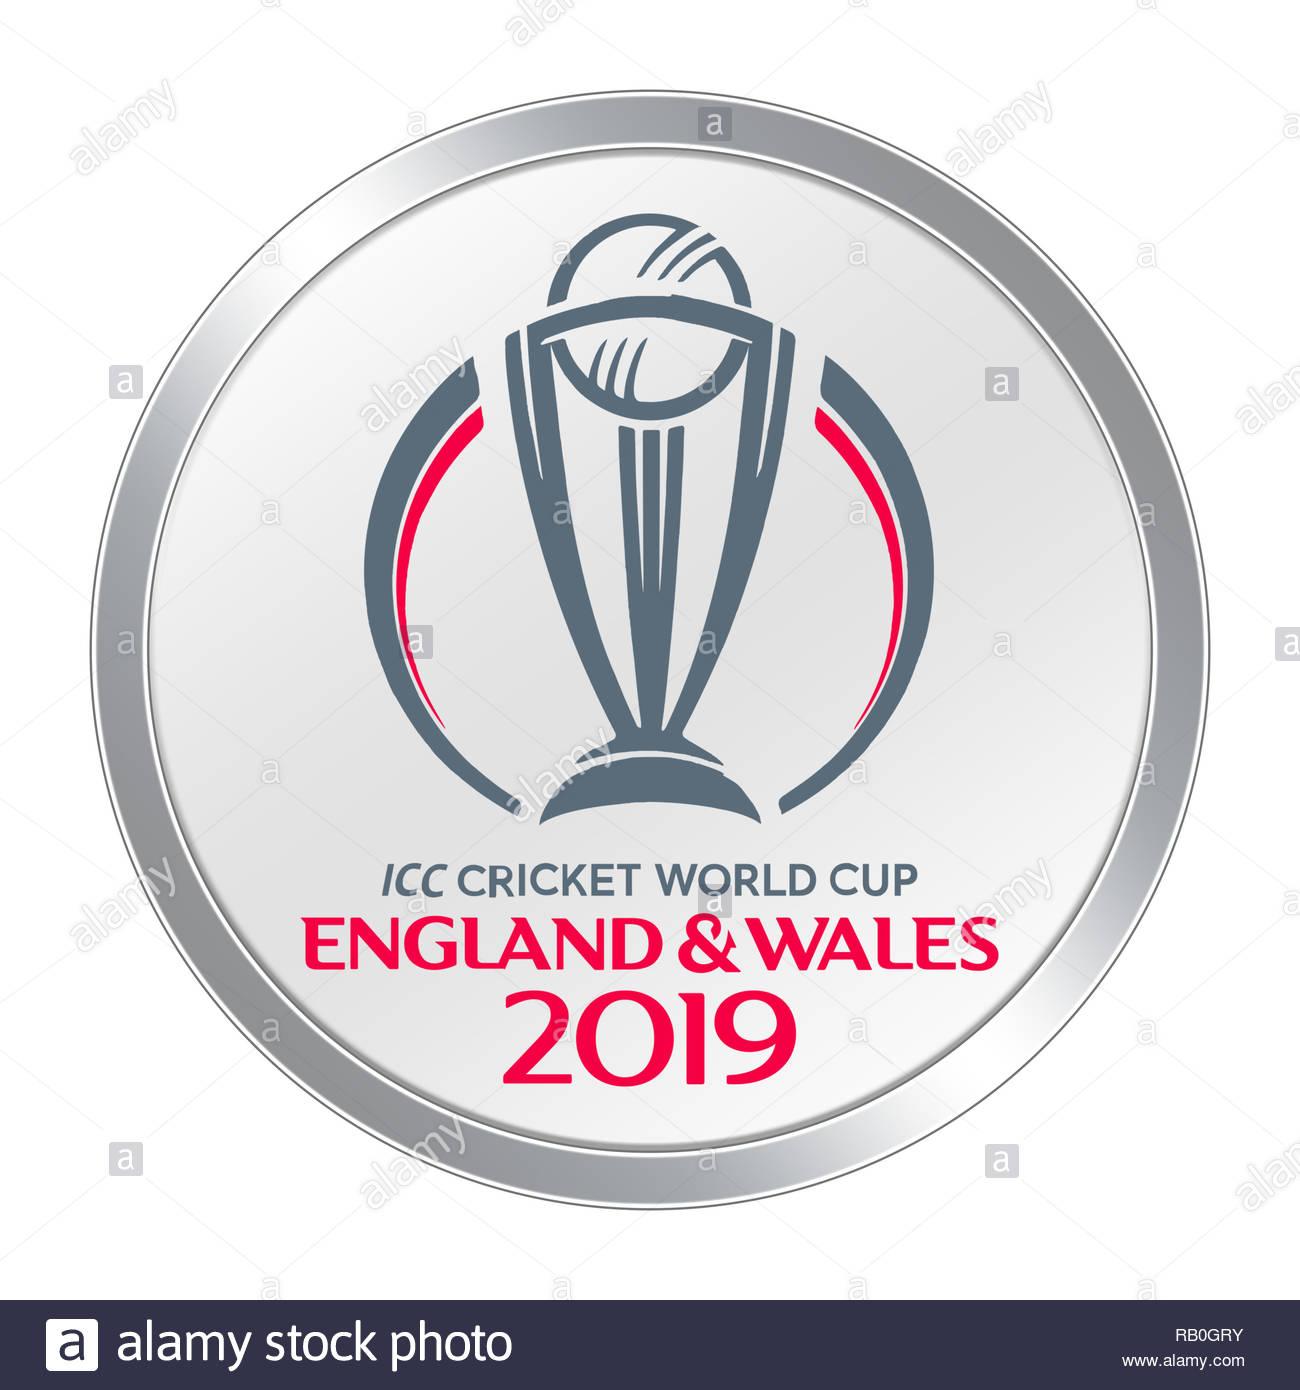 ICC Cricket World Cup logo icon - Stock Image